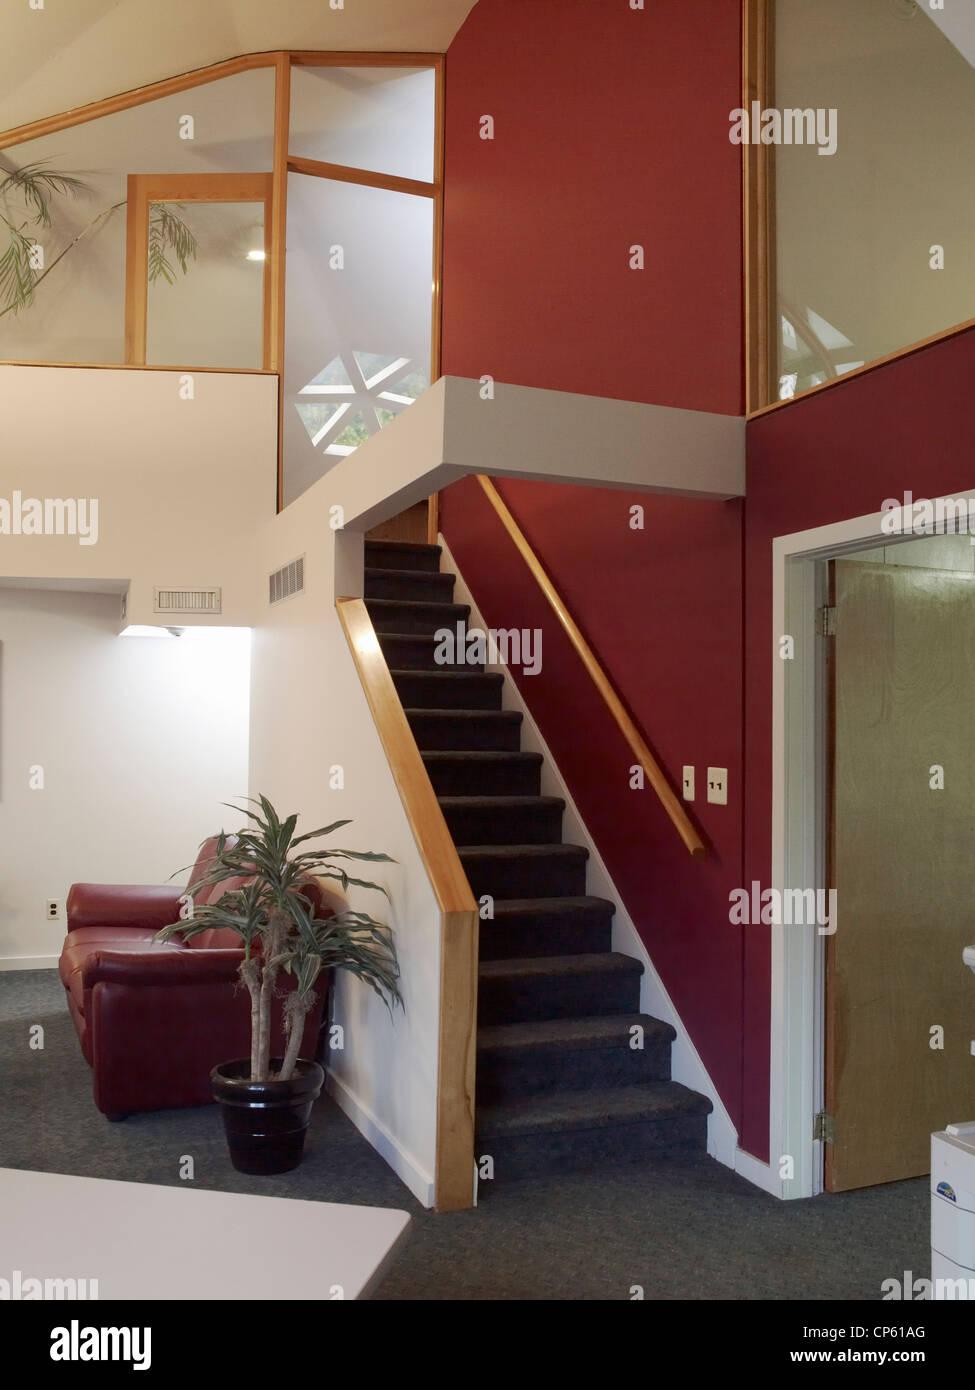 Geometric Dome Home Interior Stock Photo: 48075960 - Alamy